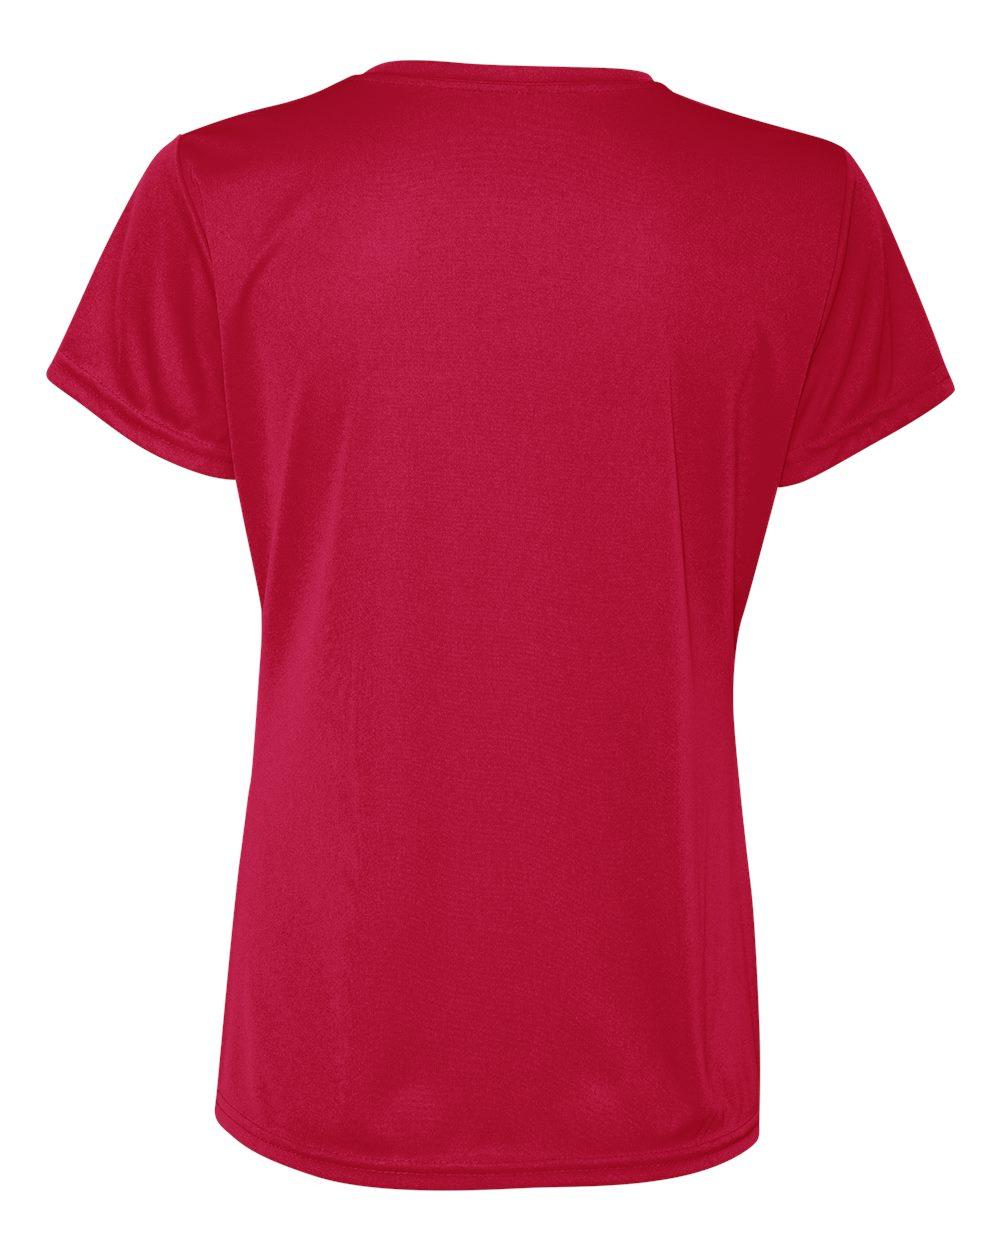 Augusta-Sportswear-Women-039-s-Moisture-Wicking-V-Neck-T-Shirt-1790-XS-2XL thumbnail 28